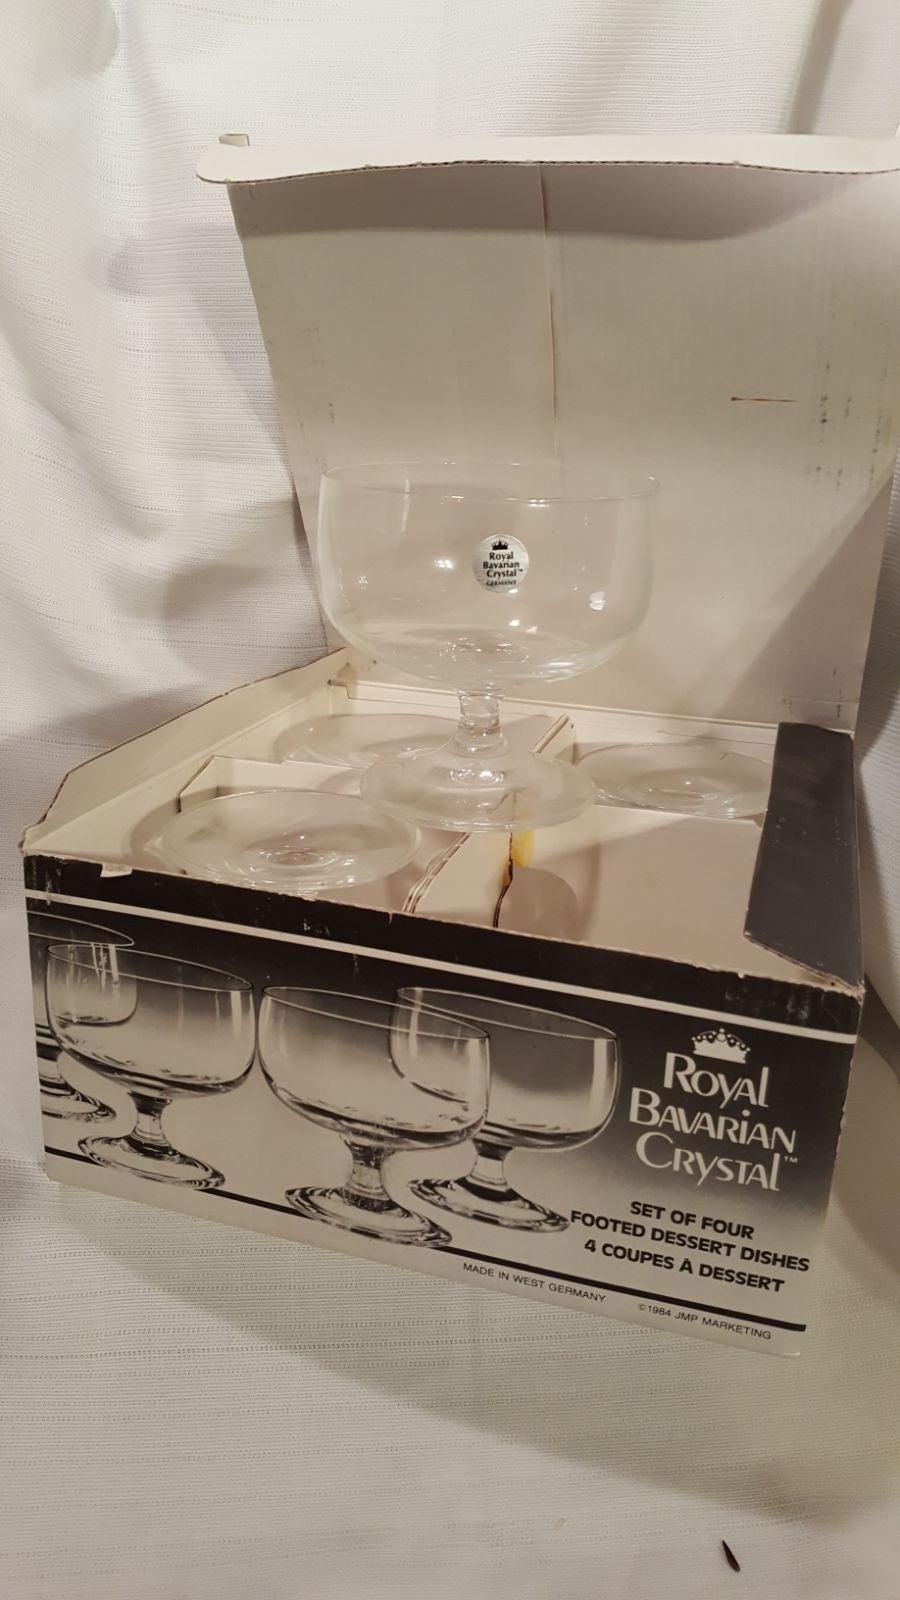 Vintage Royal Bavarian Crystal